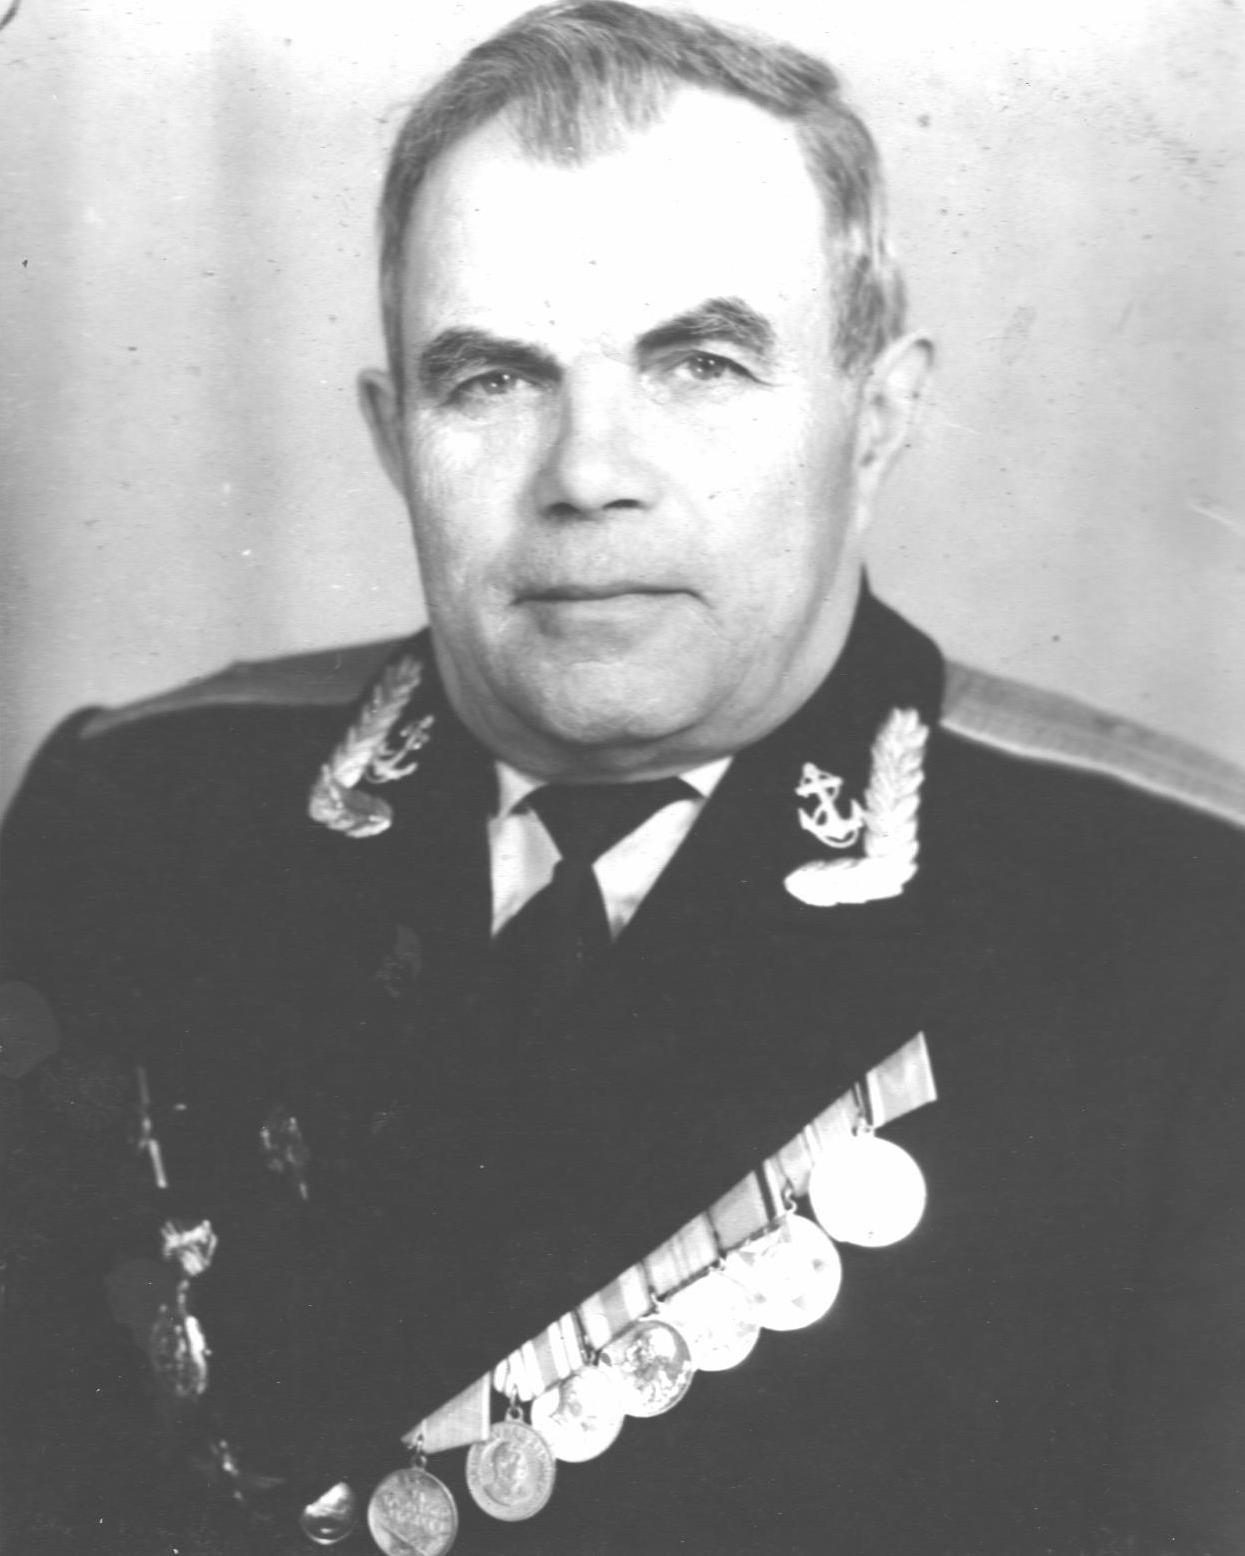 Васильев Николай Сергеевич